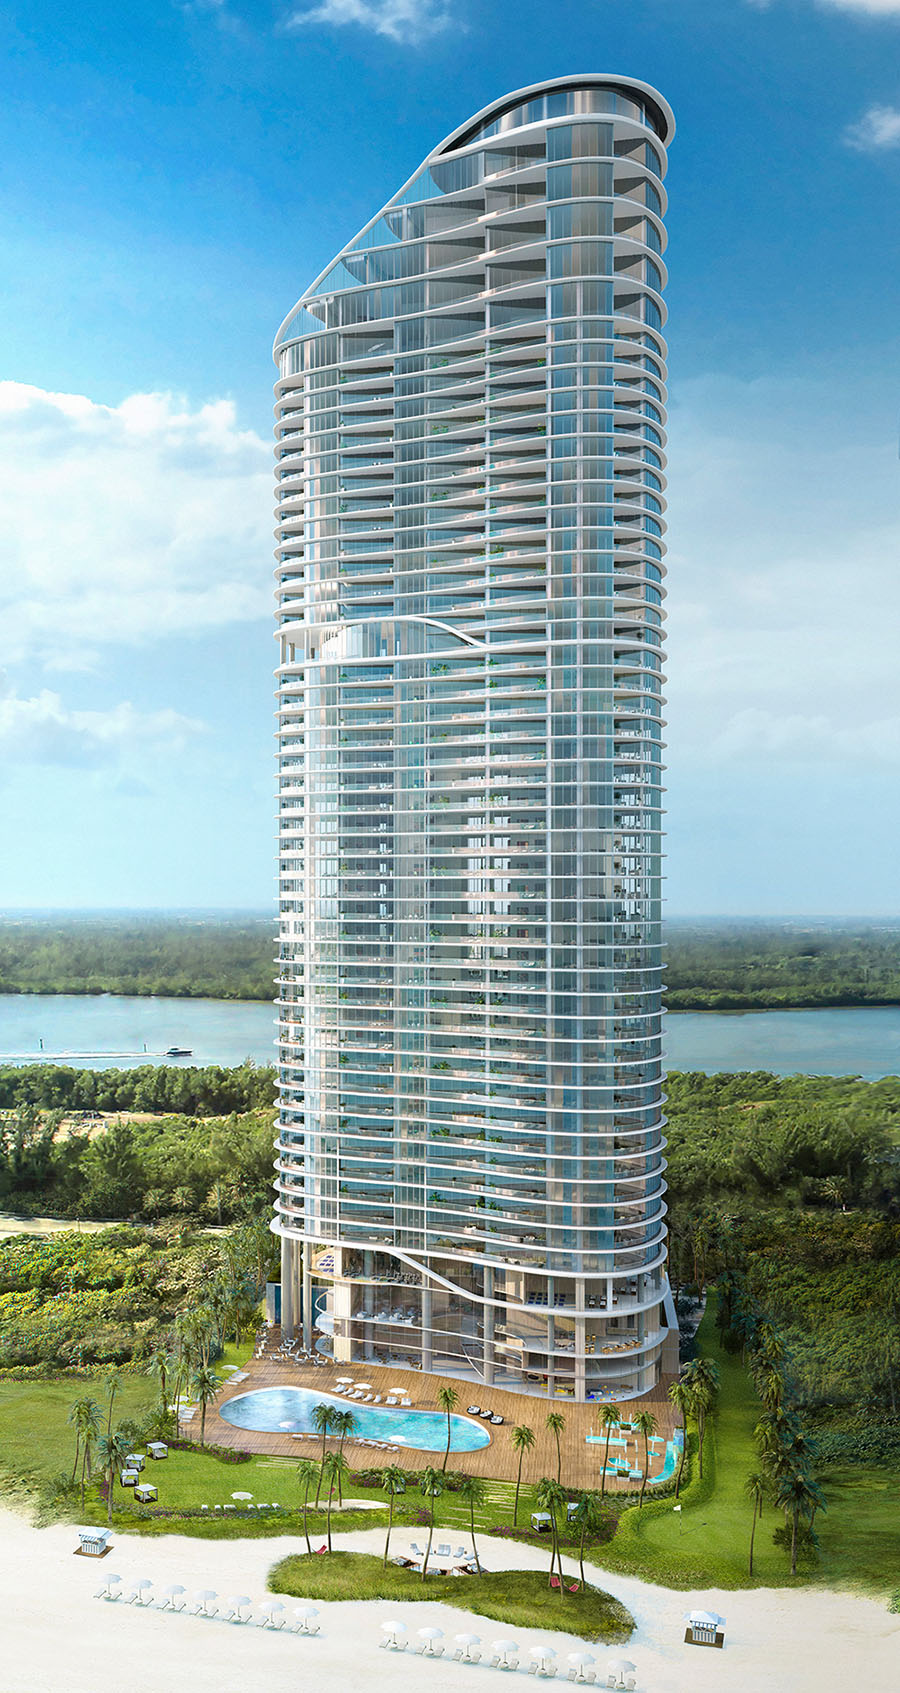 Ritz-Carlton Residences Sunny Isles Beach - Image 6